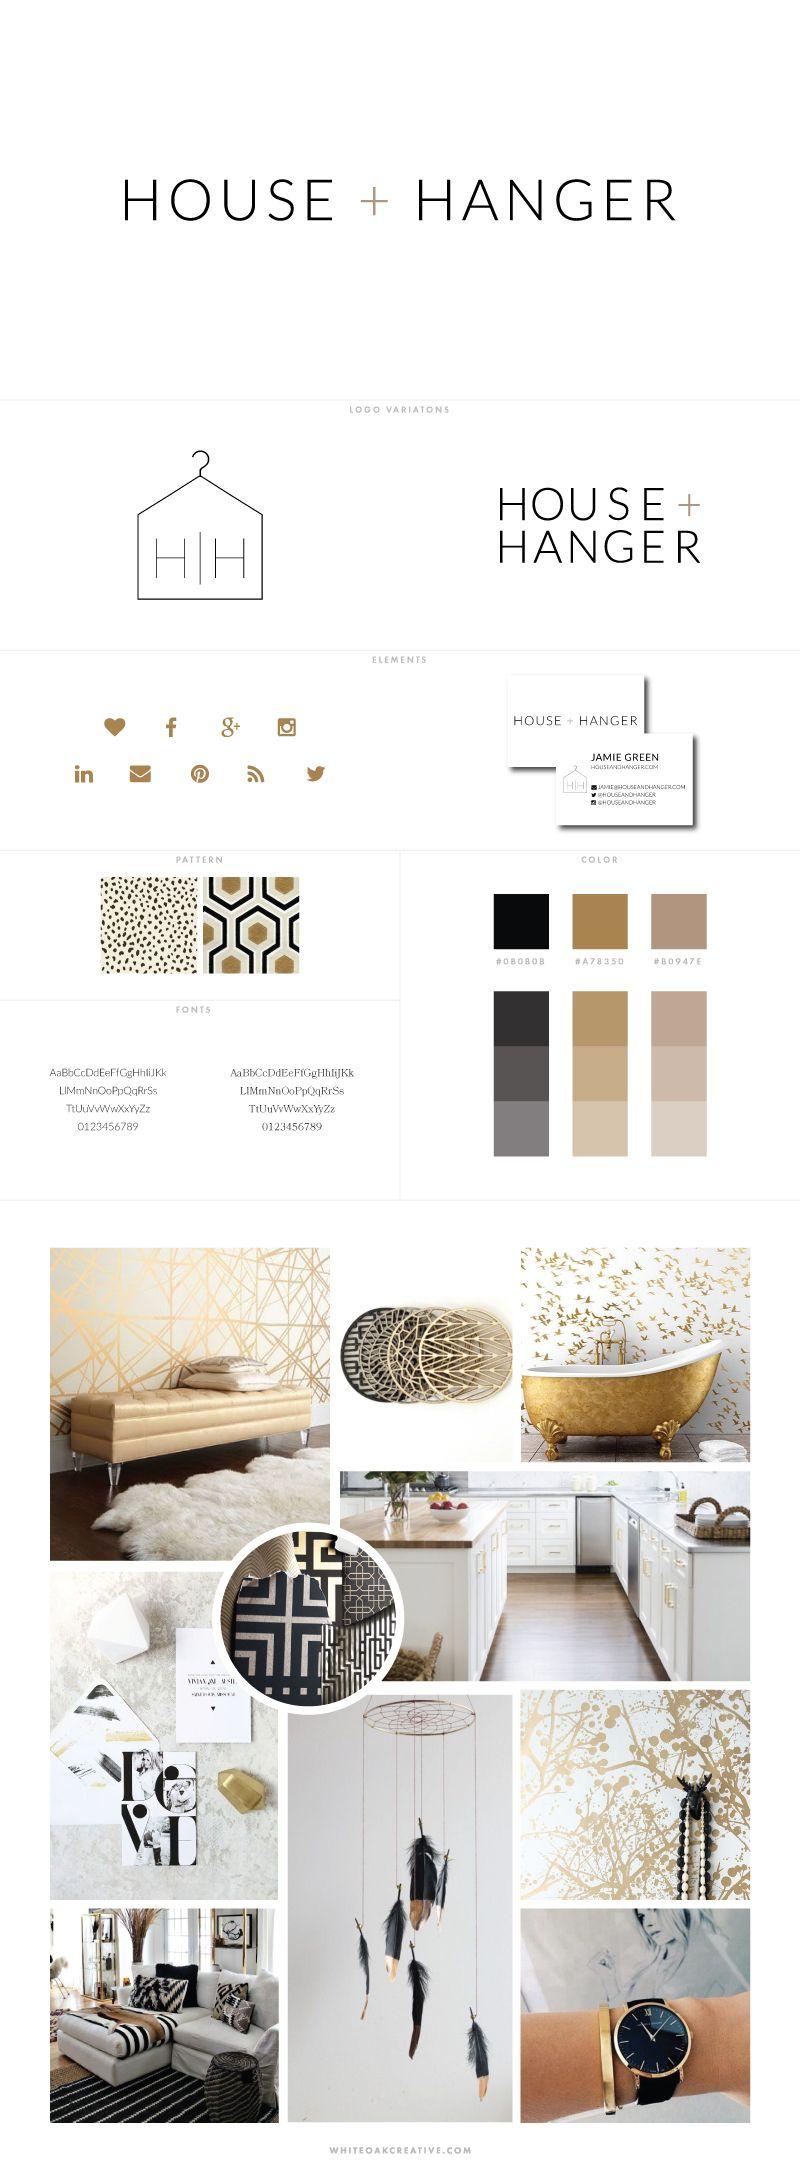 House + Hanger | Creative, Logo design and Blog headers